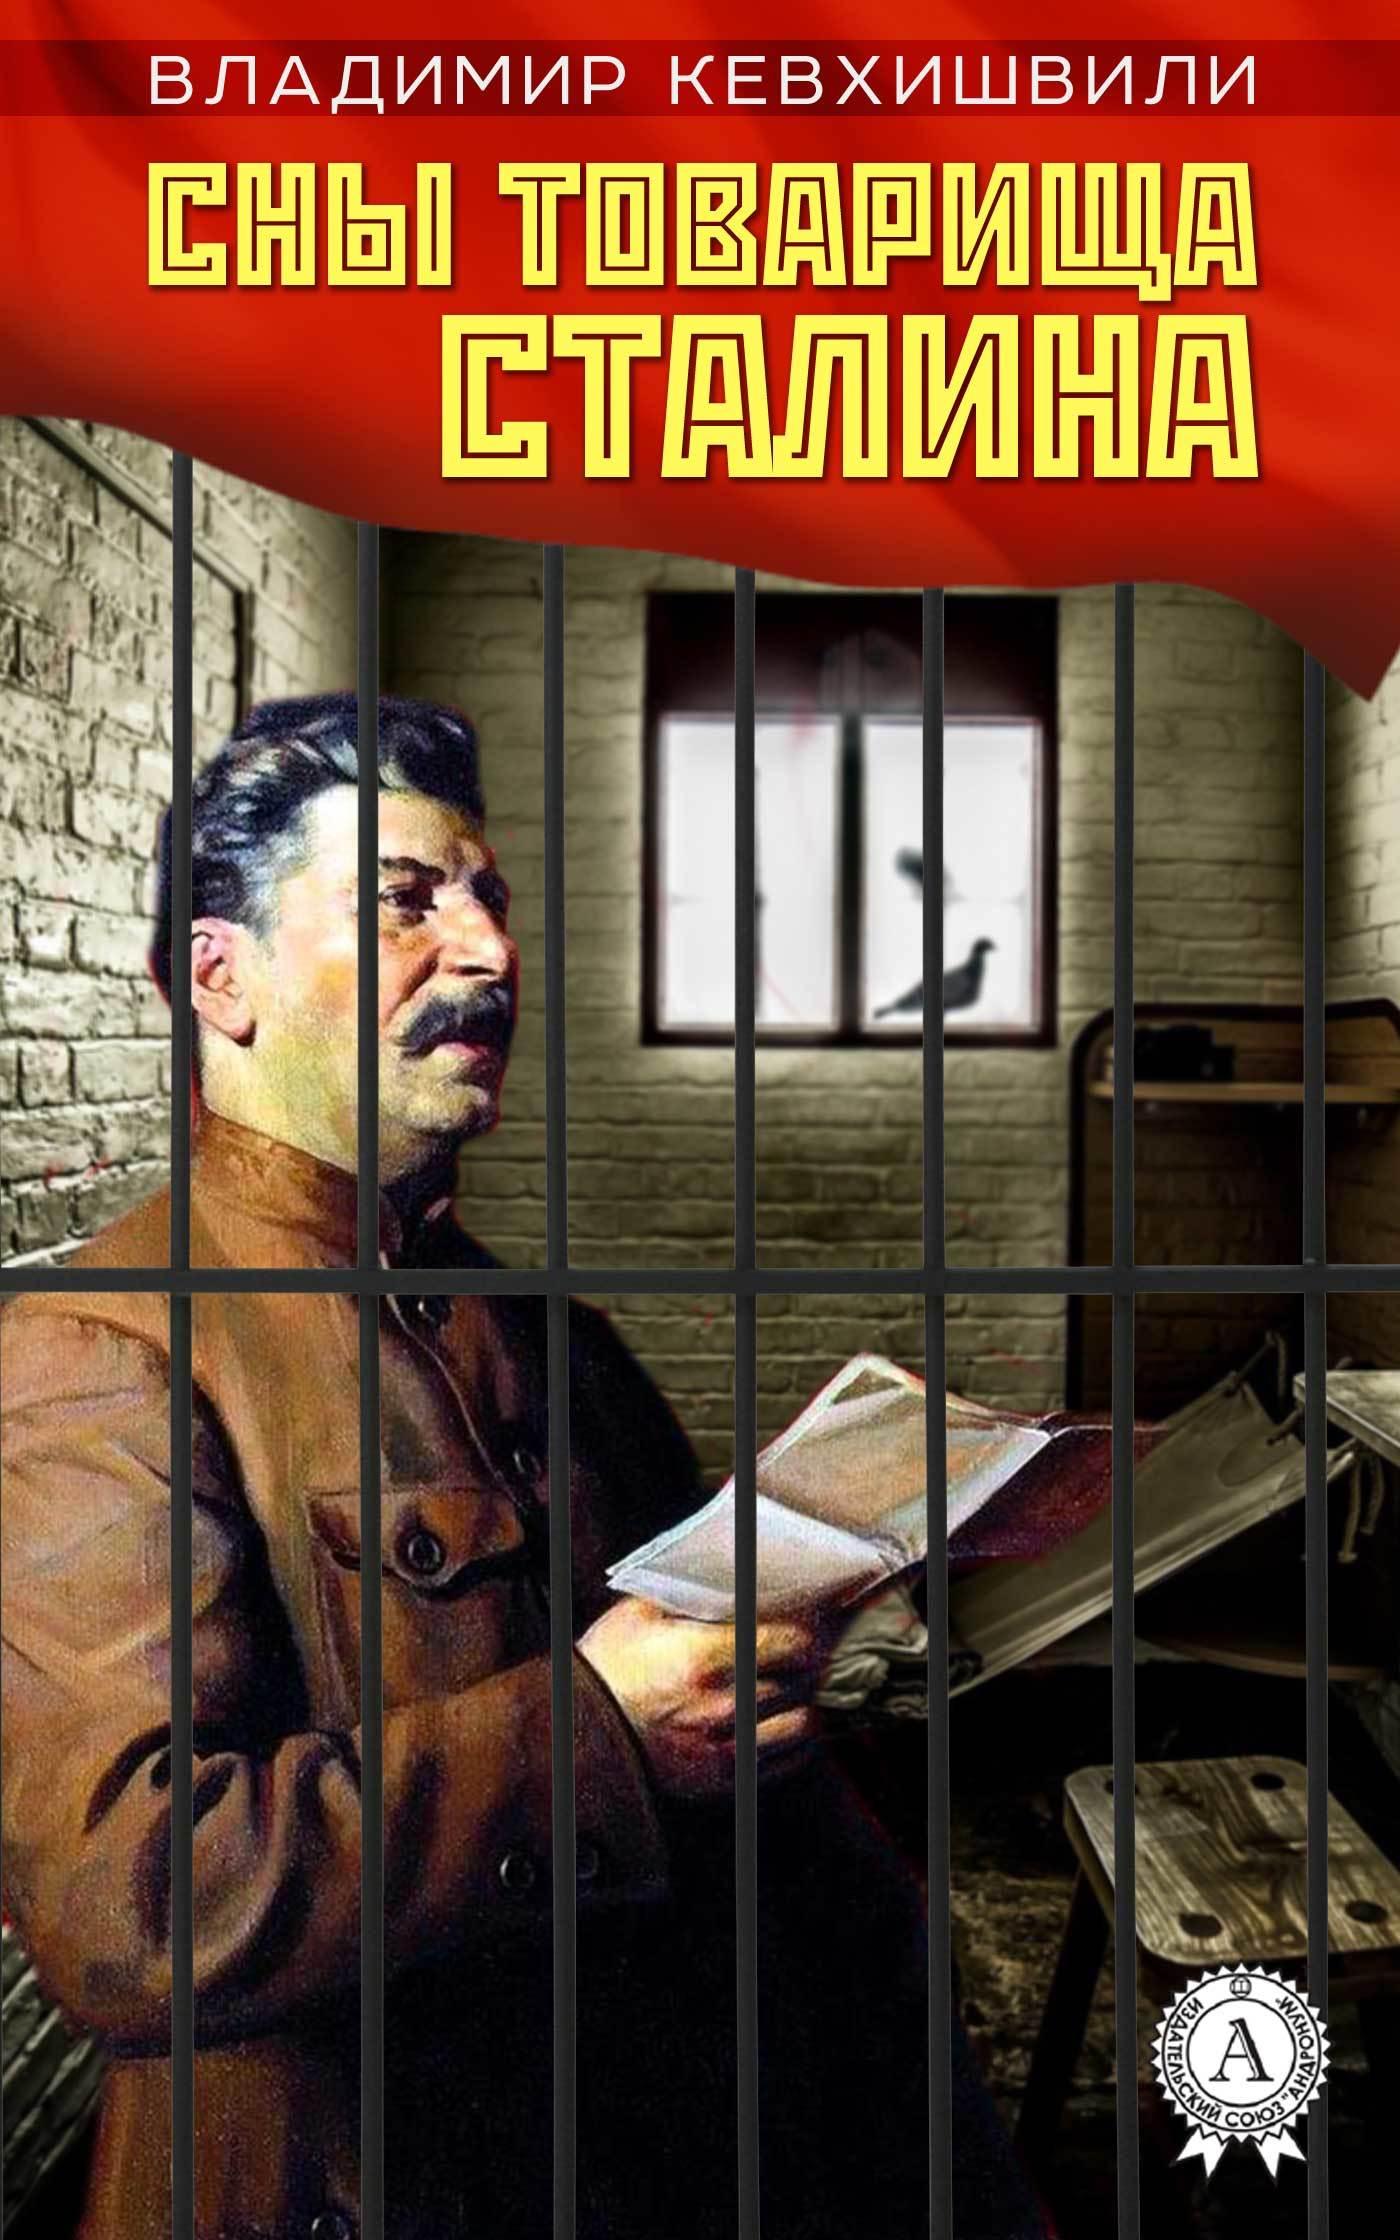 Владимир Кевхишвили Сны товарища Сталина три товарища 2016 12 09t19 00